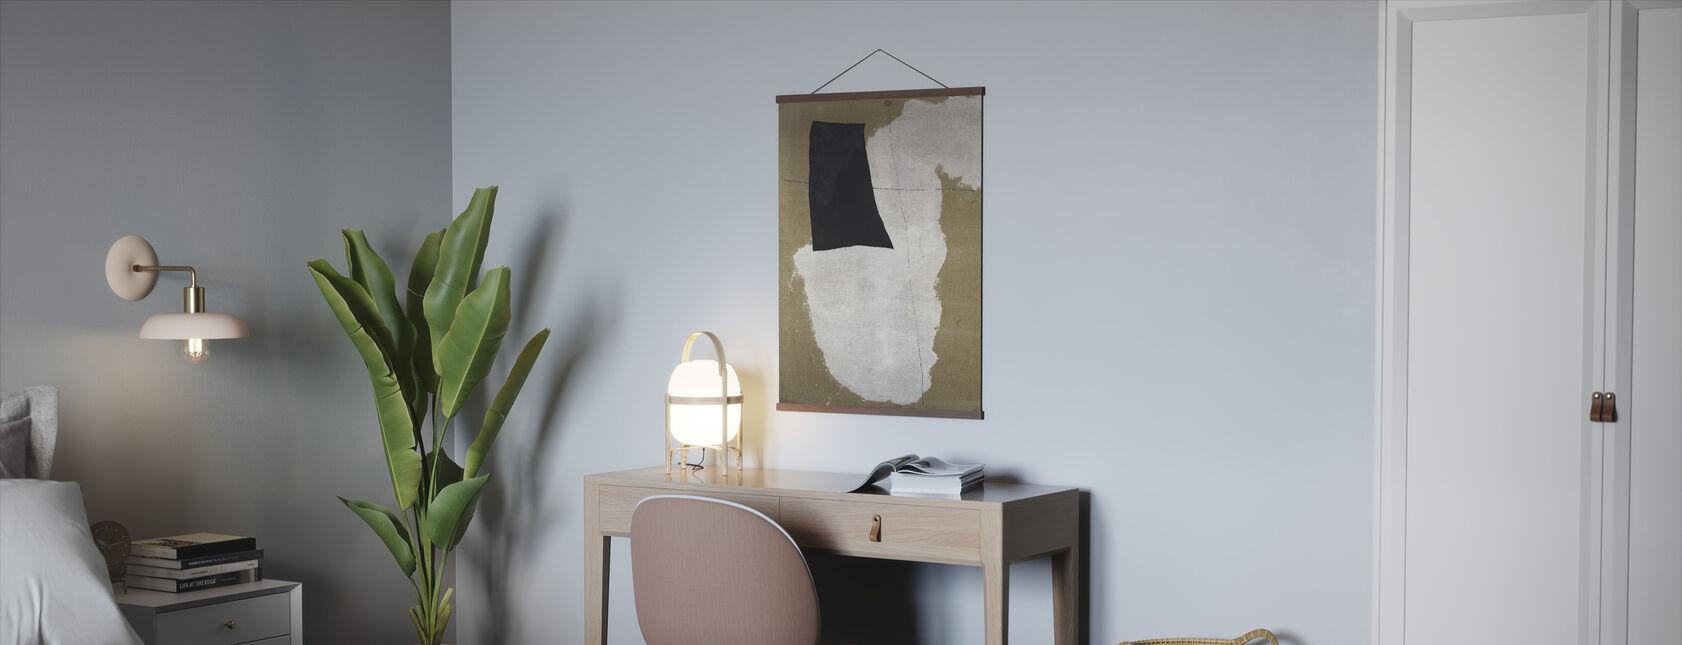 Tyrefægter - Joan Miro - Plakat - Kontor